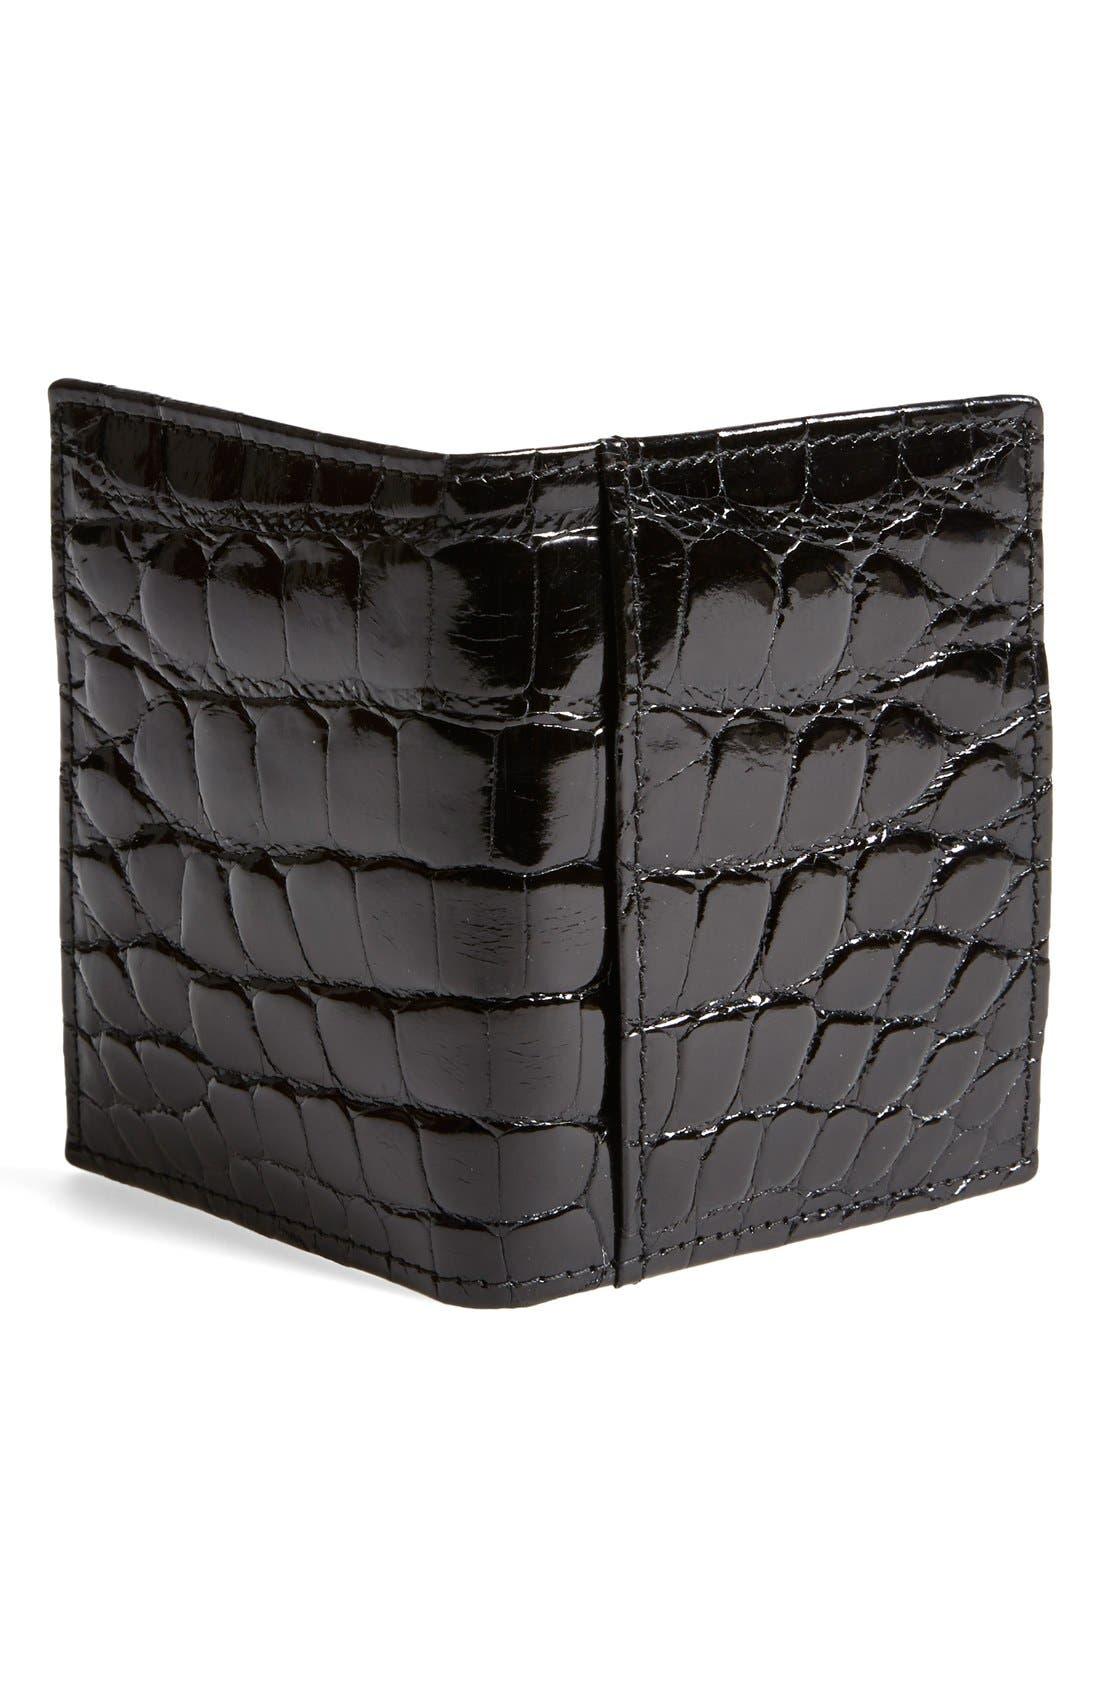 'Joseph' Genuine American Alligator Leather ID Wallet,                             Alternate thumbnail 3, color,                             001